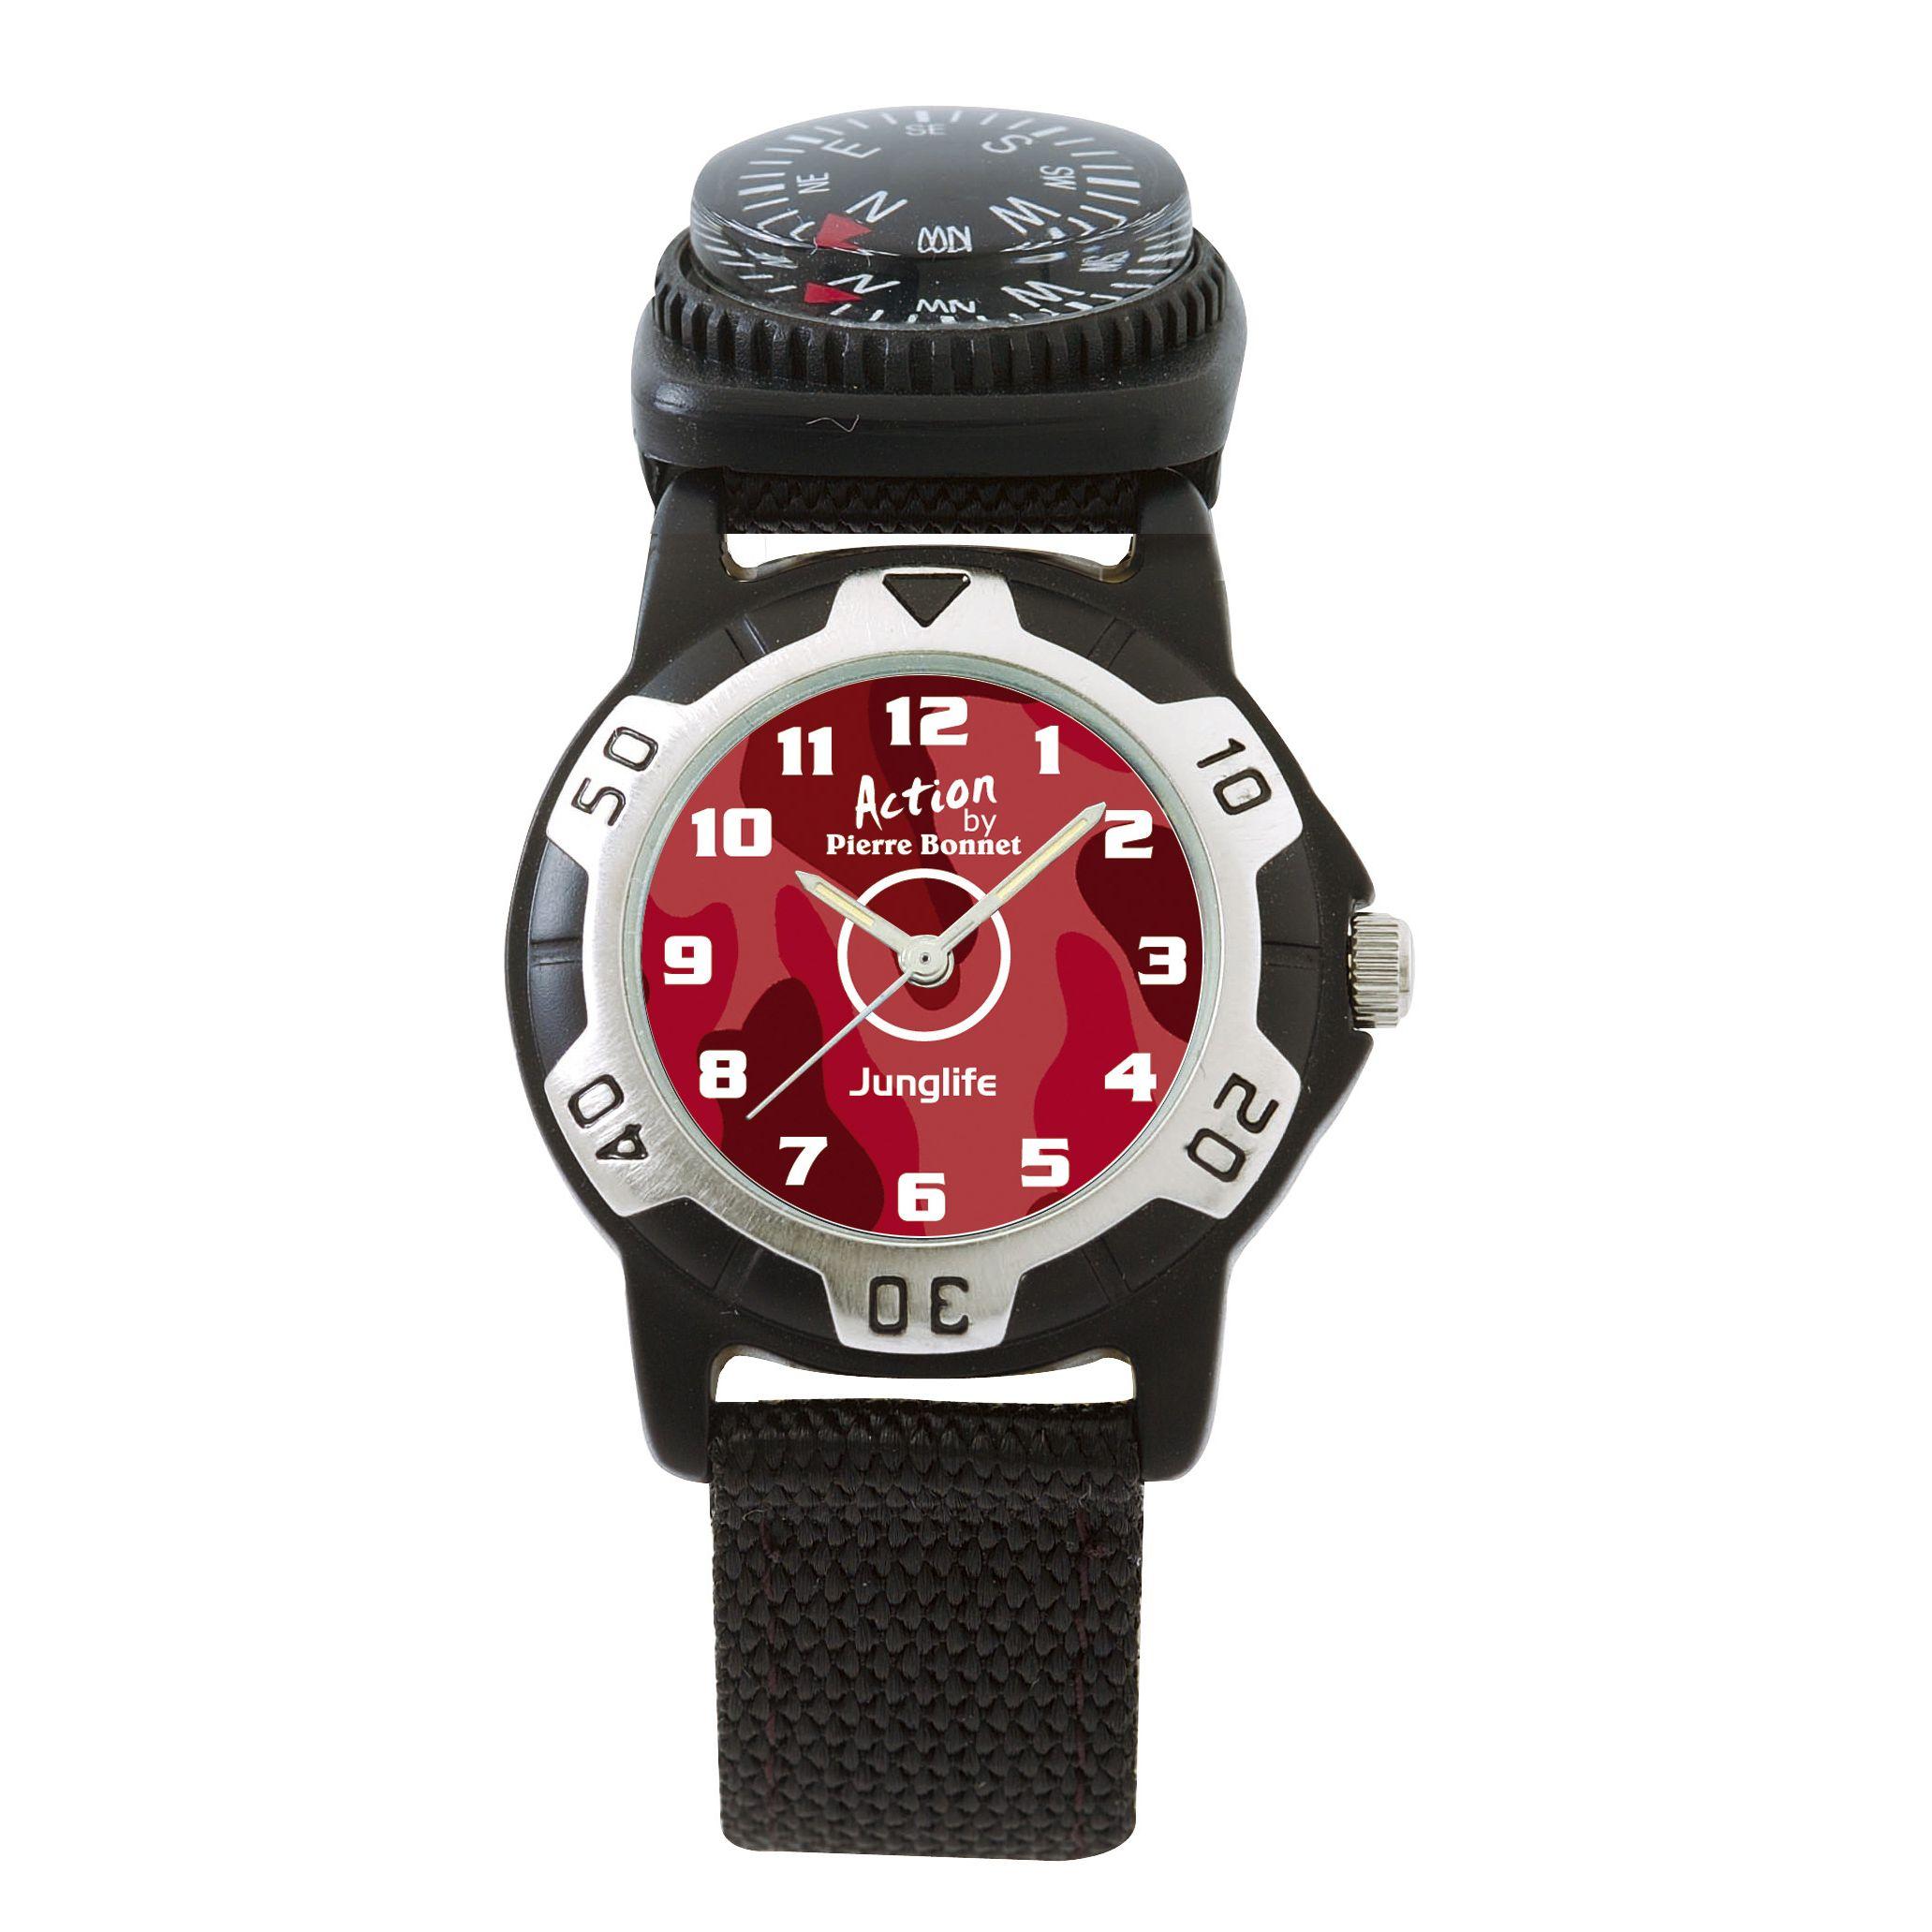 Orologio unisex Pierre Bonnet 9134 R